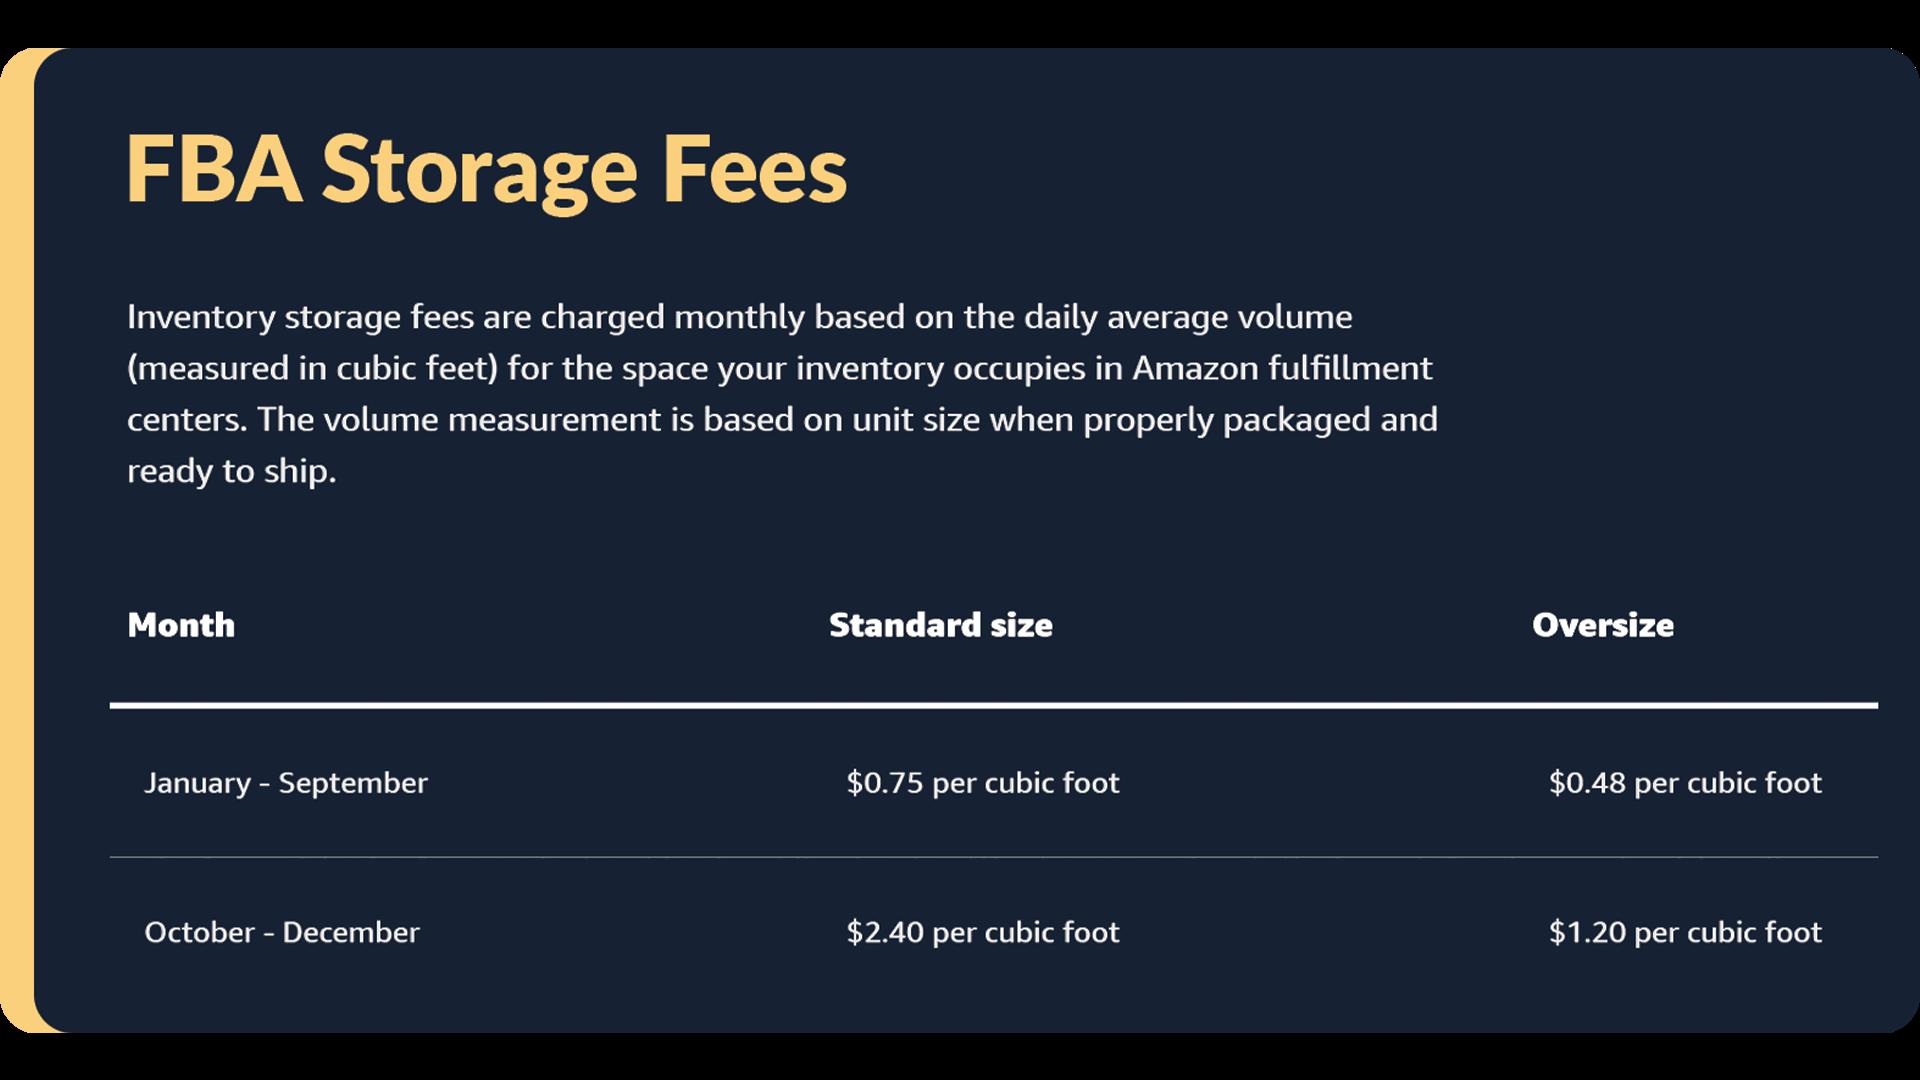 Breakdown of FBA storage fees as per Amazon's website.